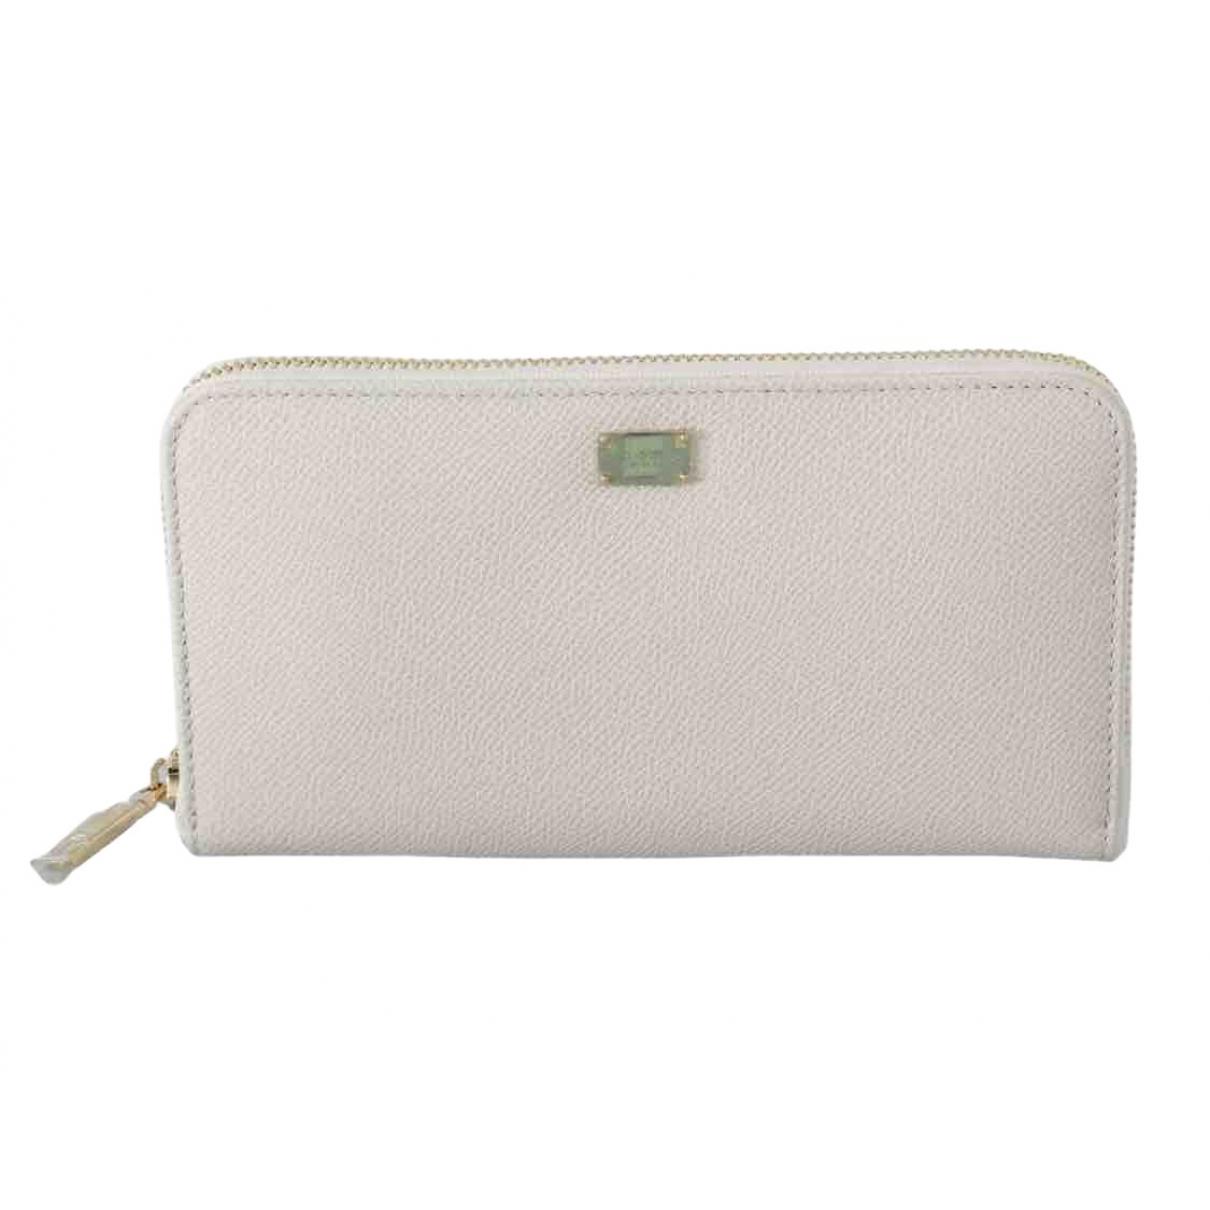 Dolce & Gabbana \N White Leather wallet for Women \N